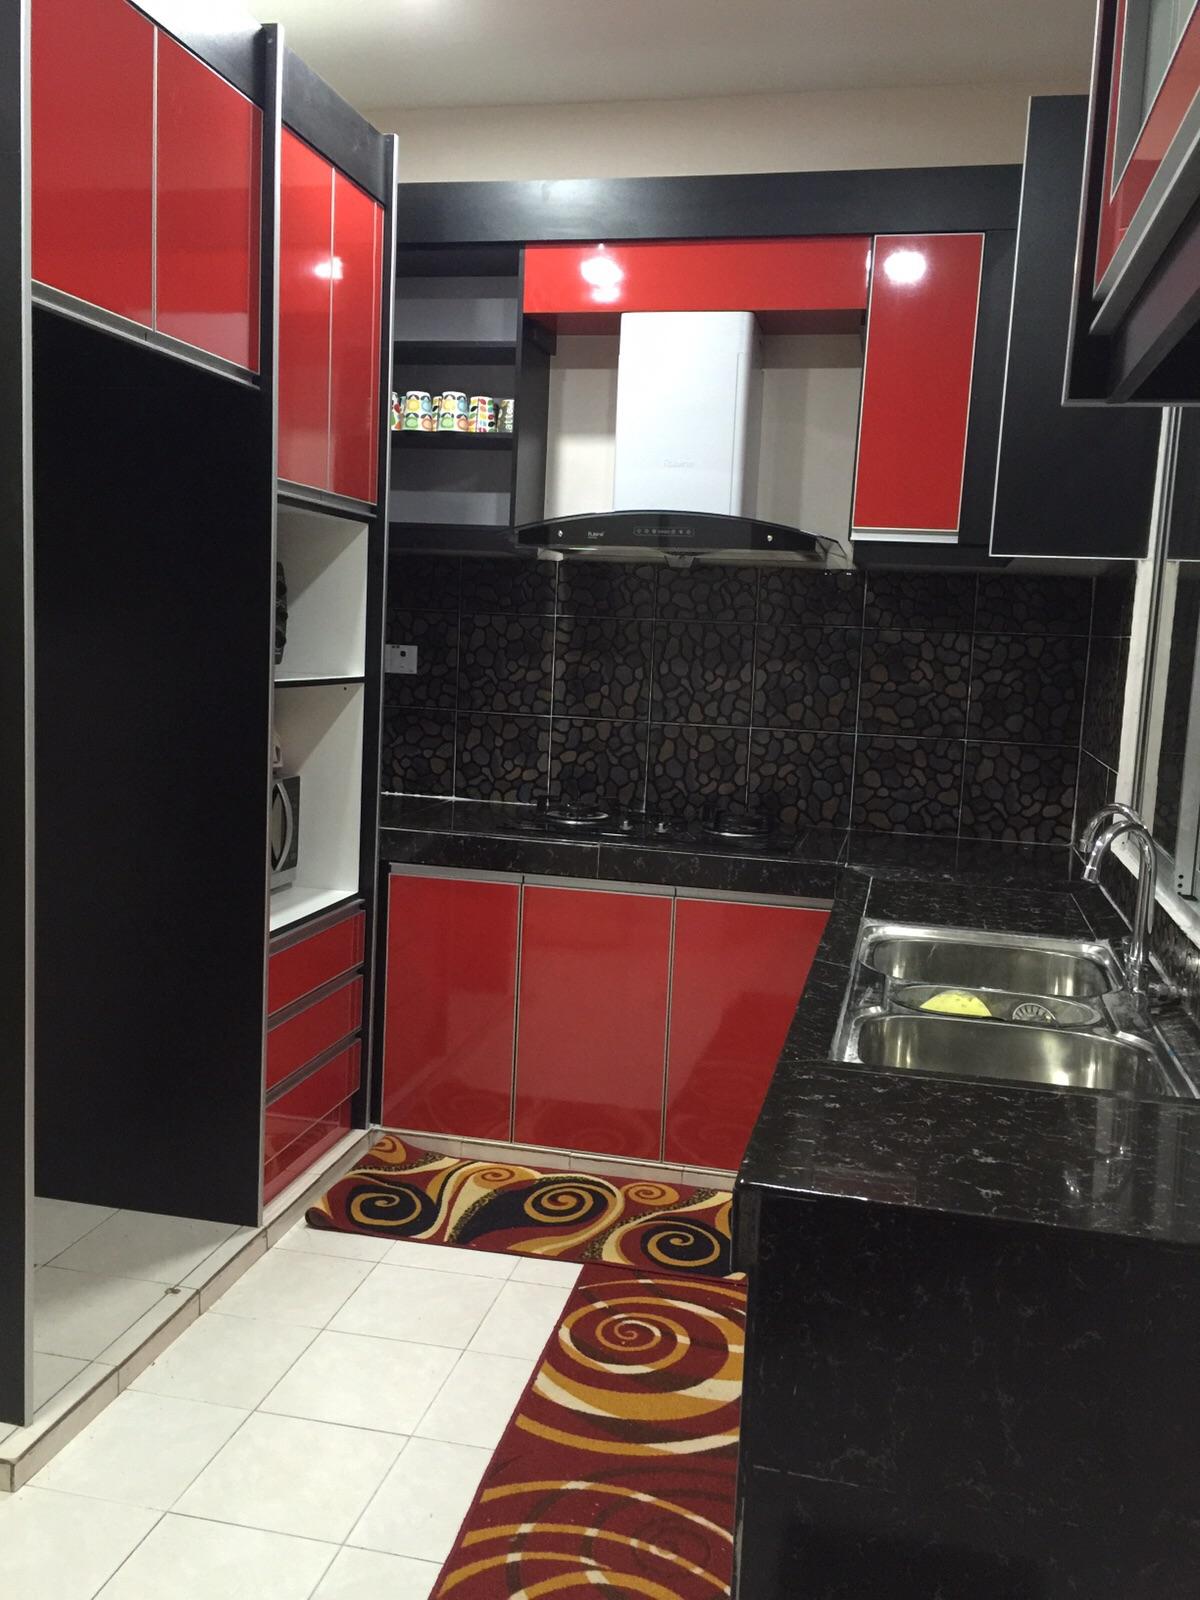 Kitchen cabinet farroda februari 2016 for Kitchen cabinet murah 2016